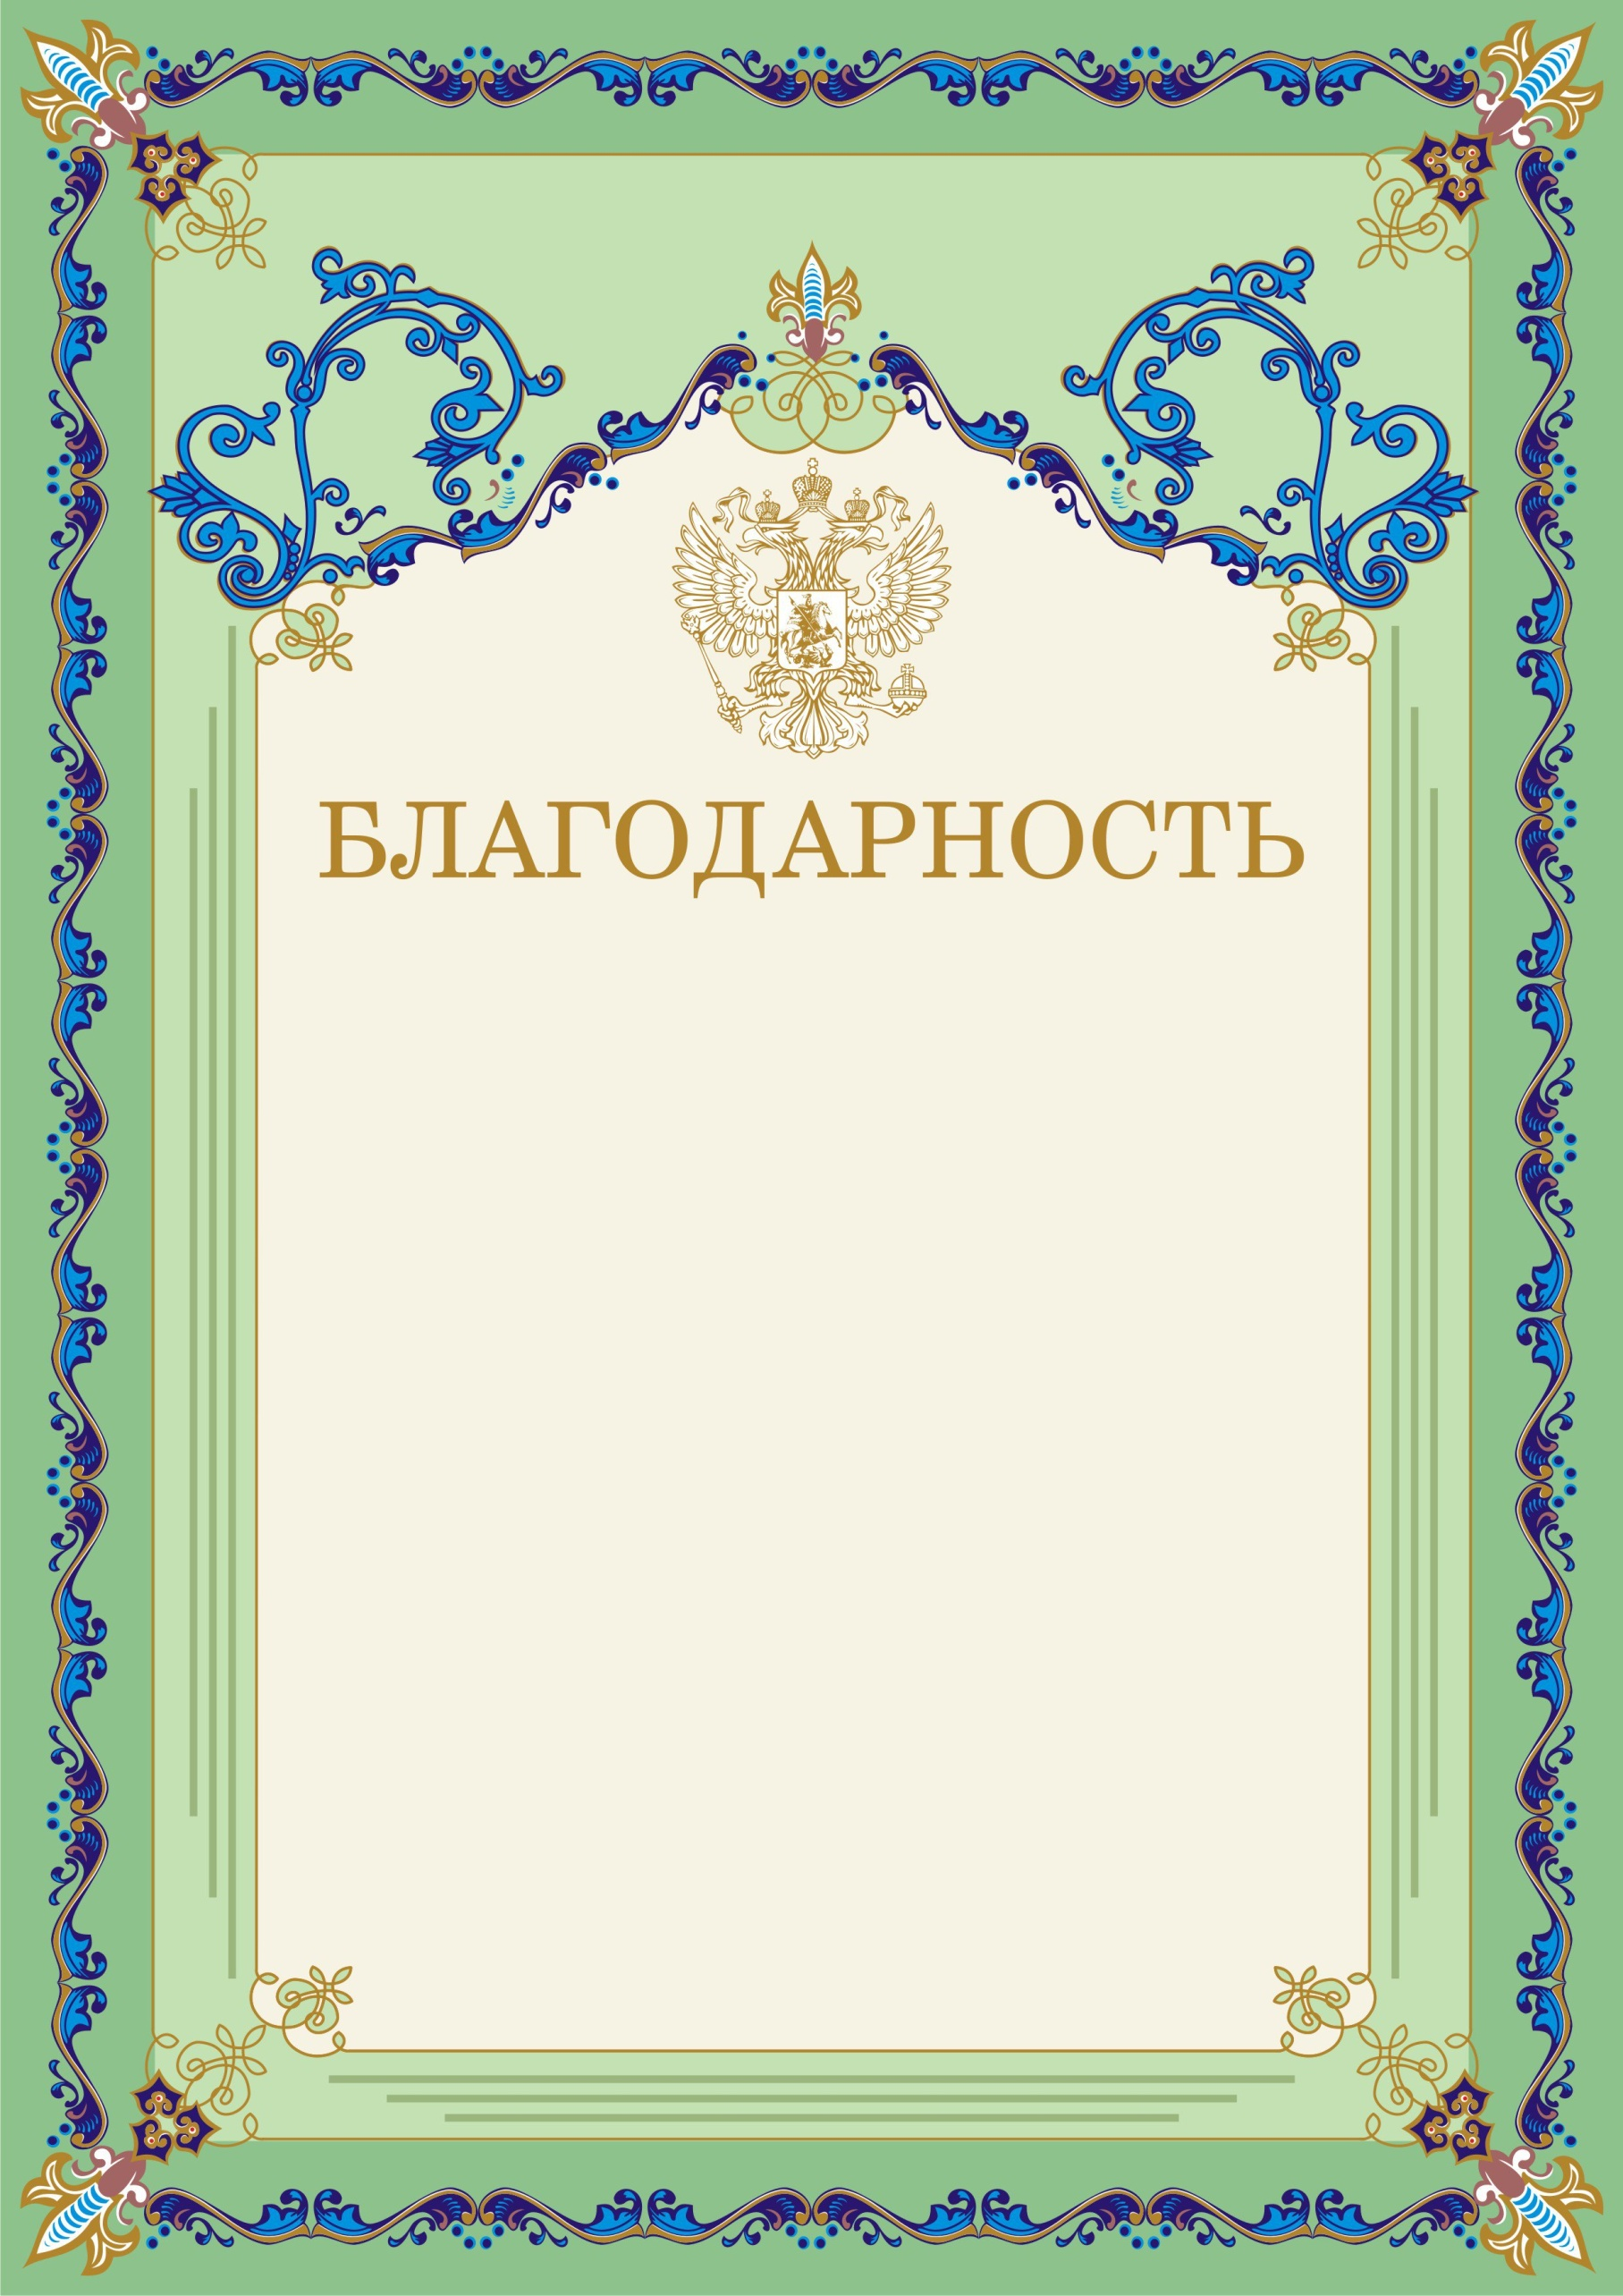 http://ad-studio-rad.ru/news/pictures/62e8001d86.jpg